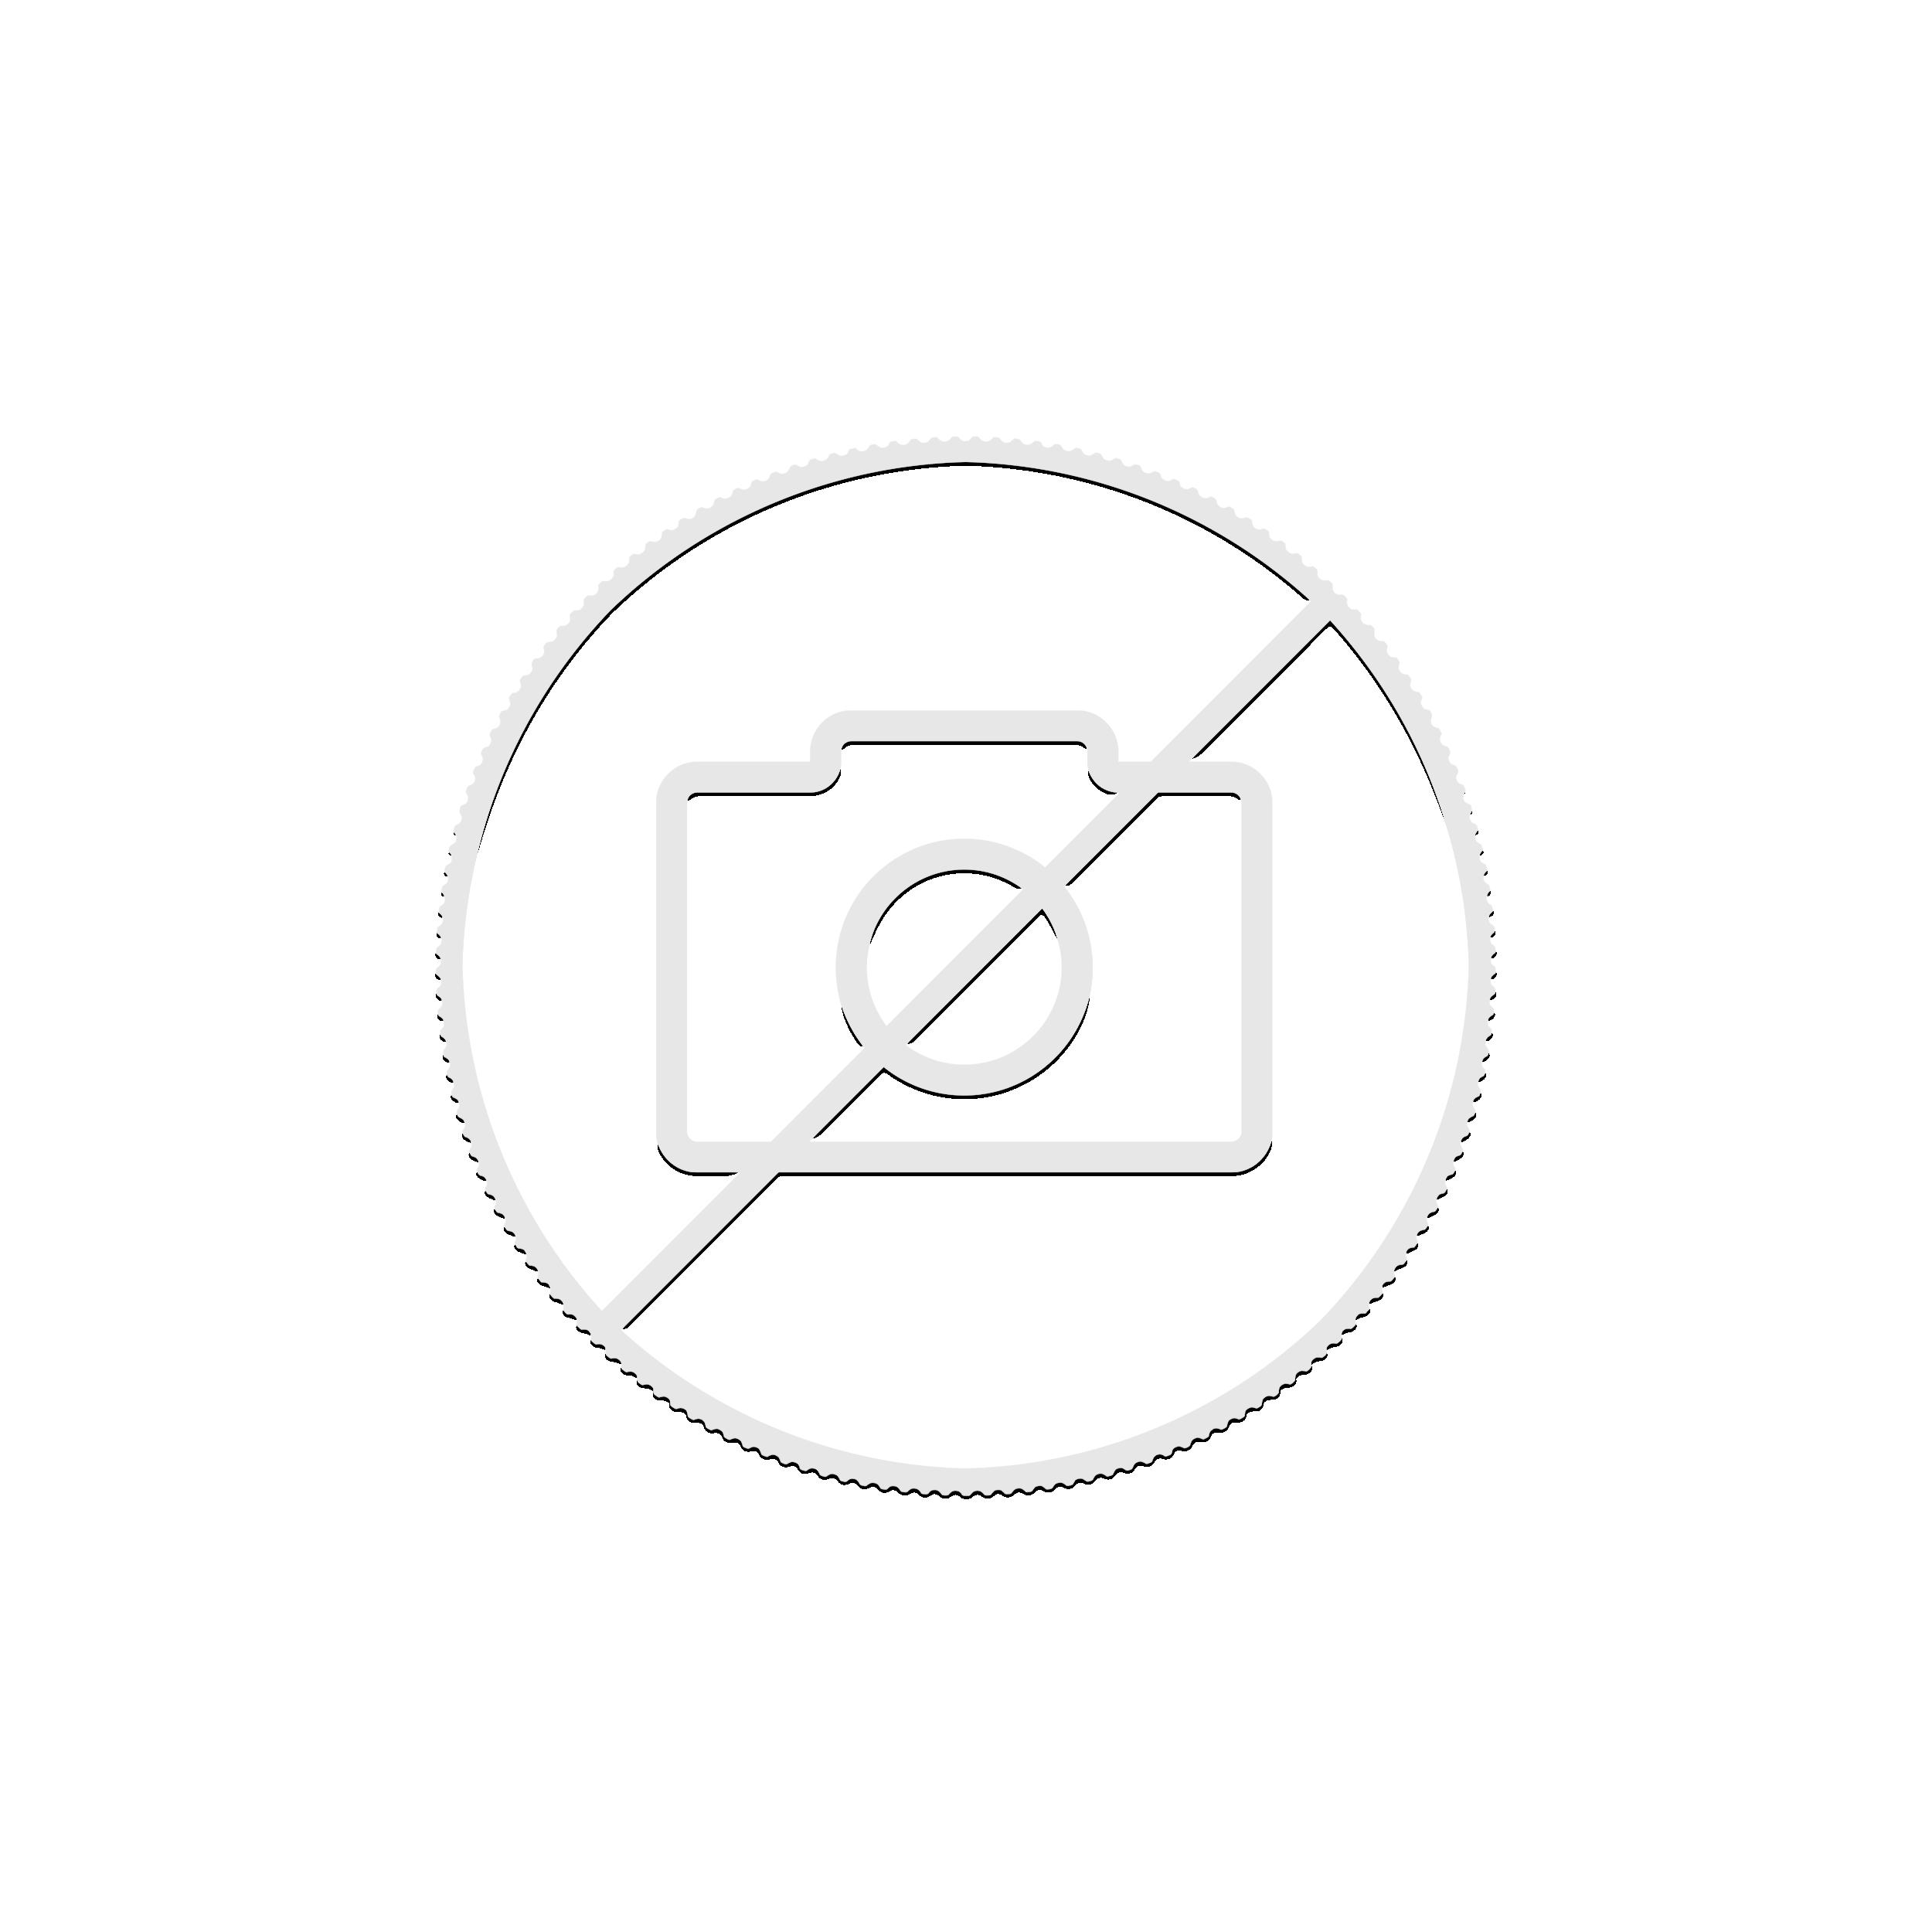 1/4 Troy ounce golden coin Lunar 2020 Proof